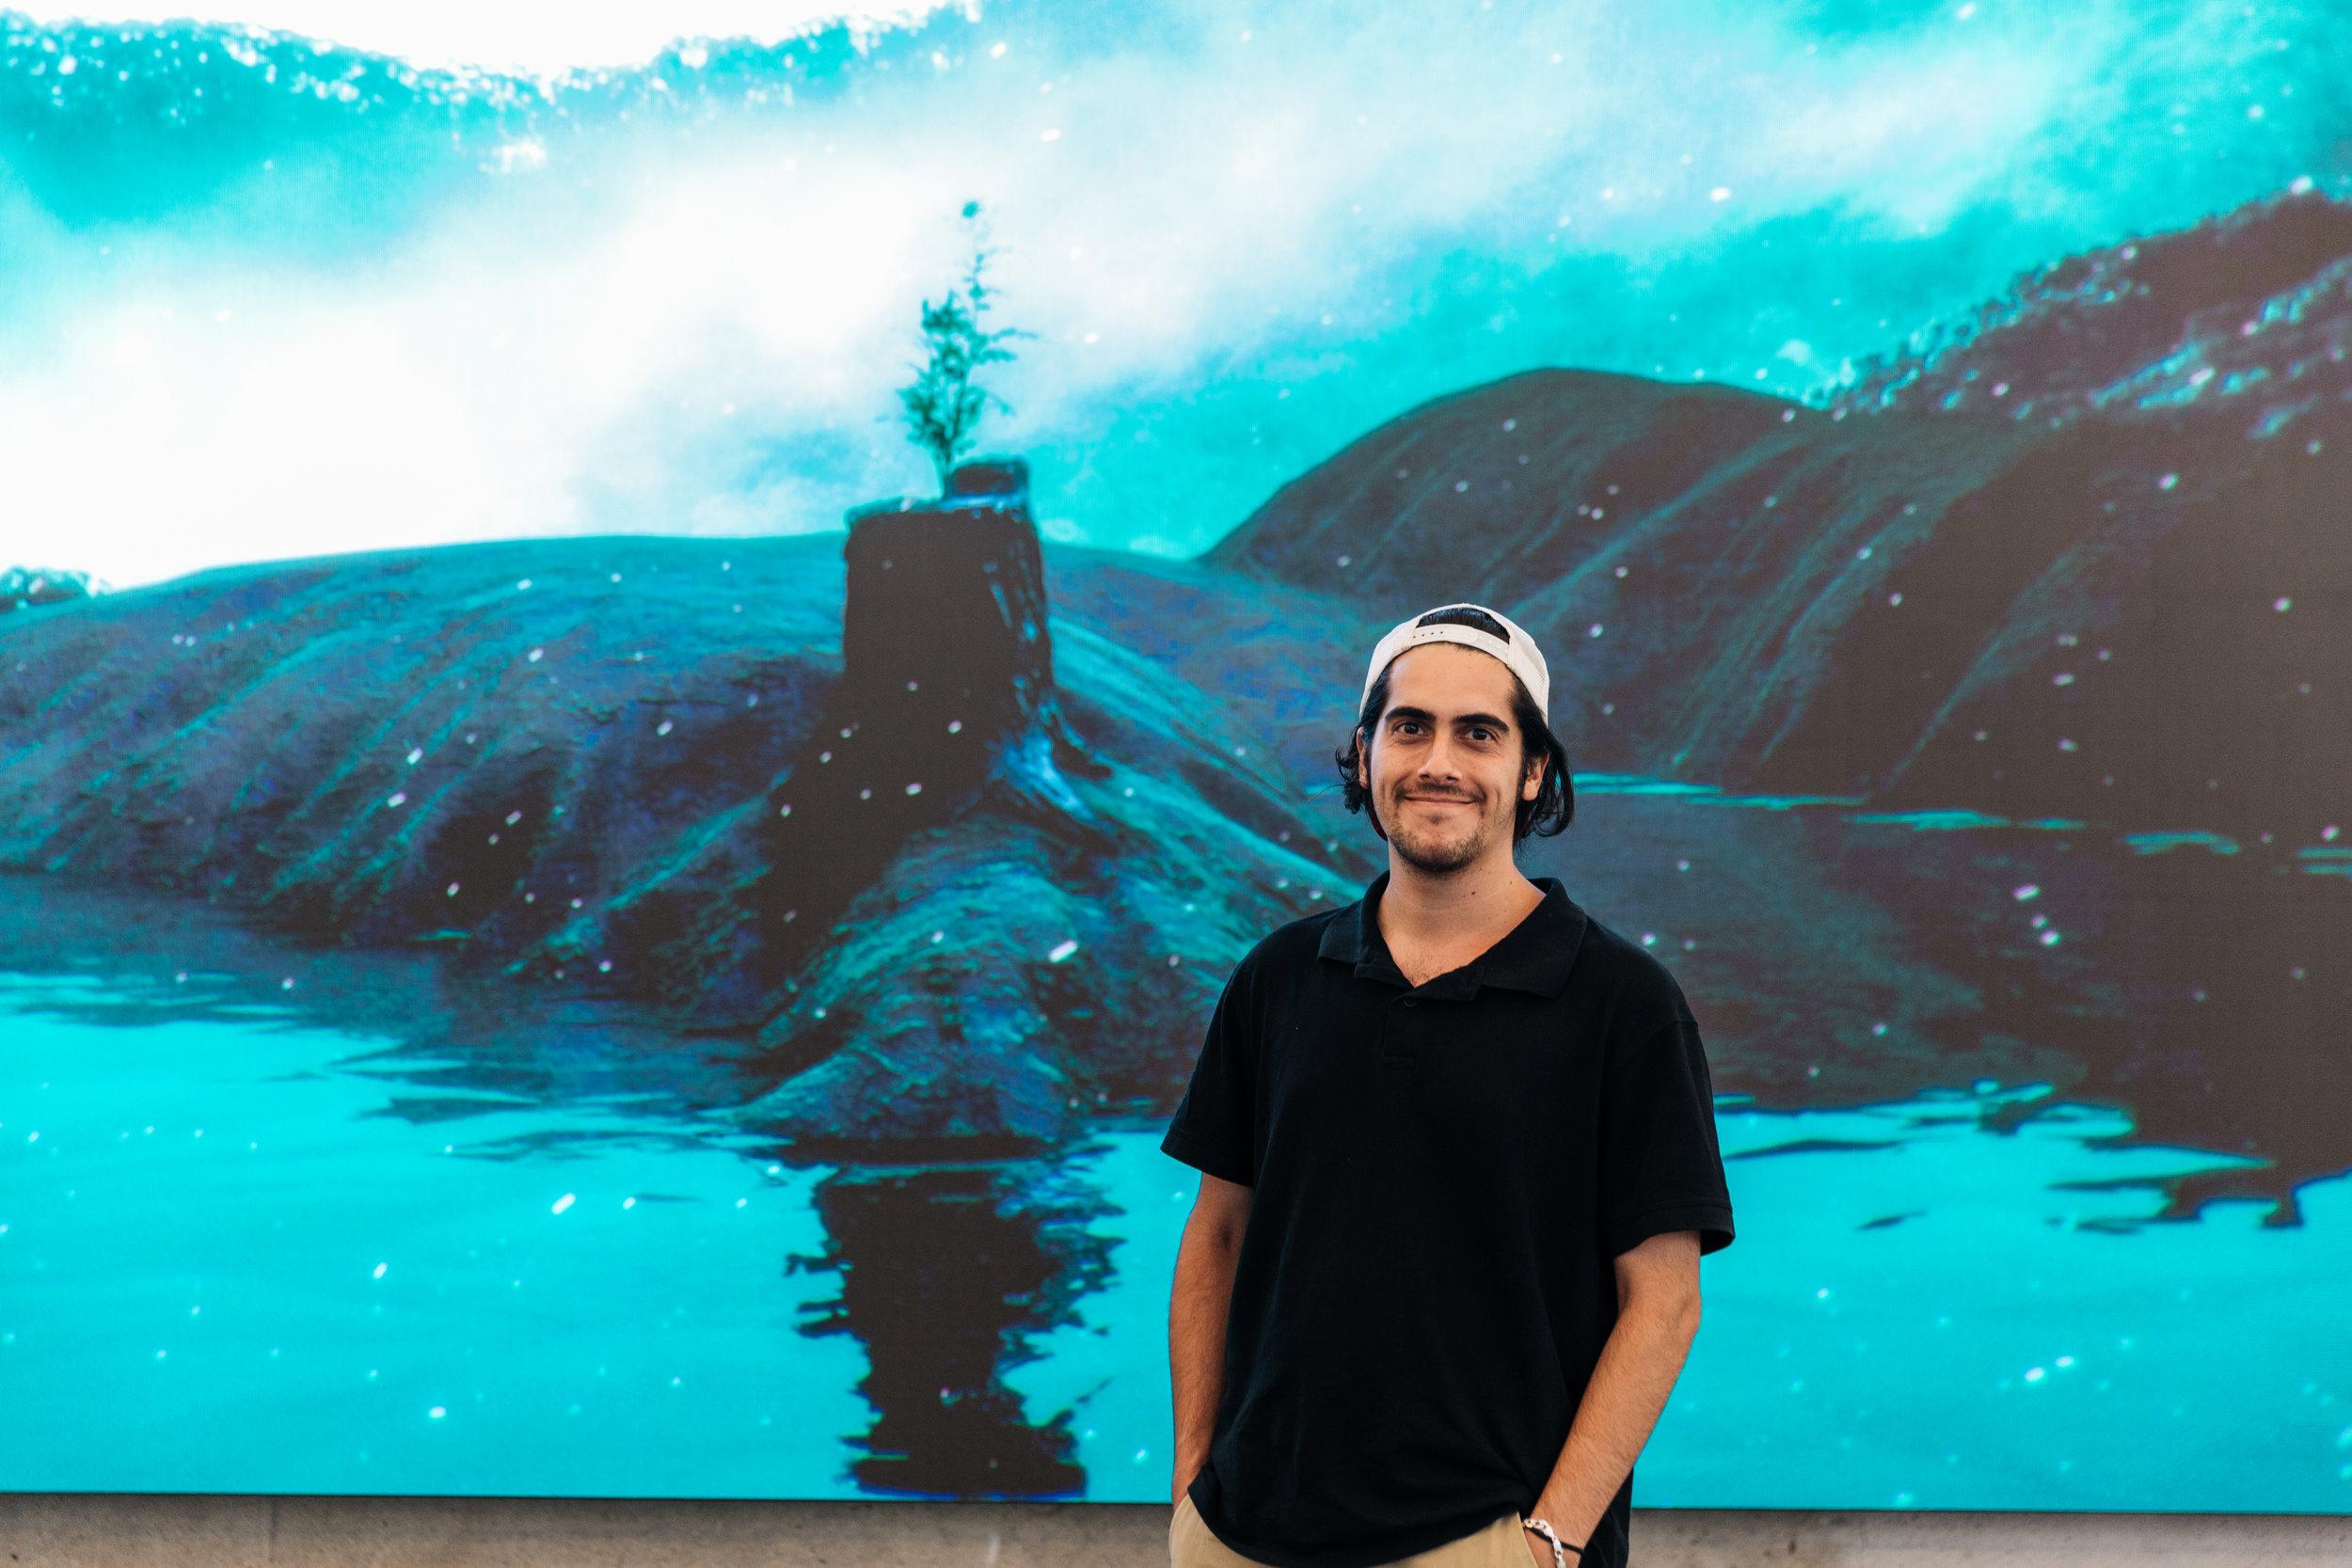 Artist Matt Schembri in front of his digital artwork at 100 Creek Street, Brisbane. Credit: Art Pharmacy Consulting/Savannah van der Niet